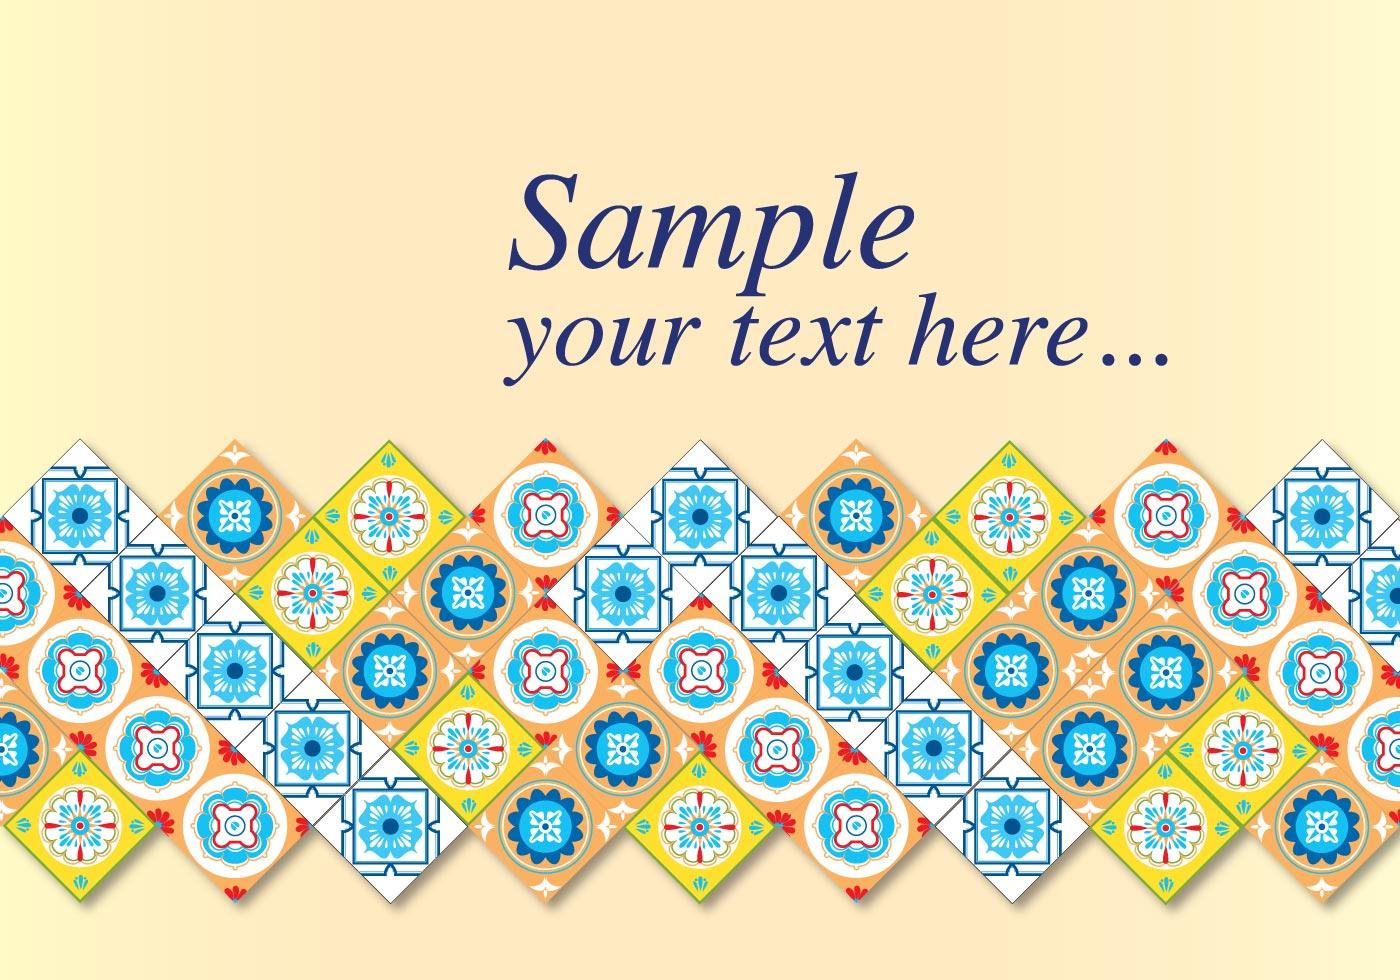 Talavera tile vector invitation download free vector art stock talavera tile vector invitation download free vector art stock graphics images stopboris Images